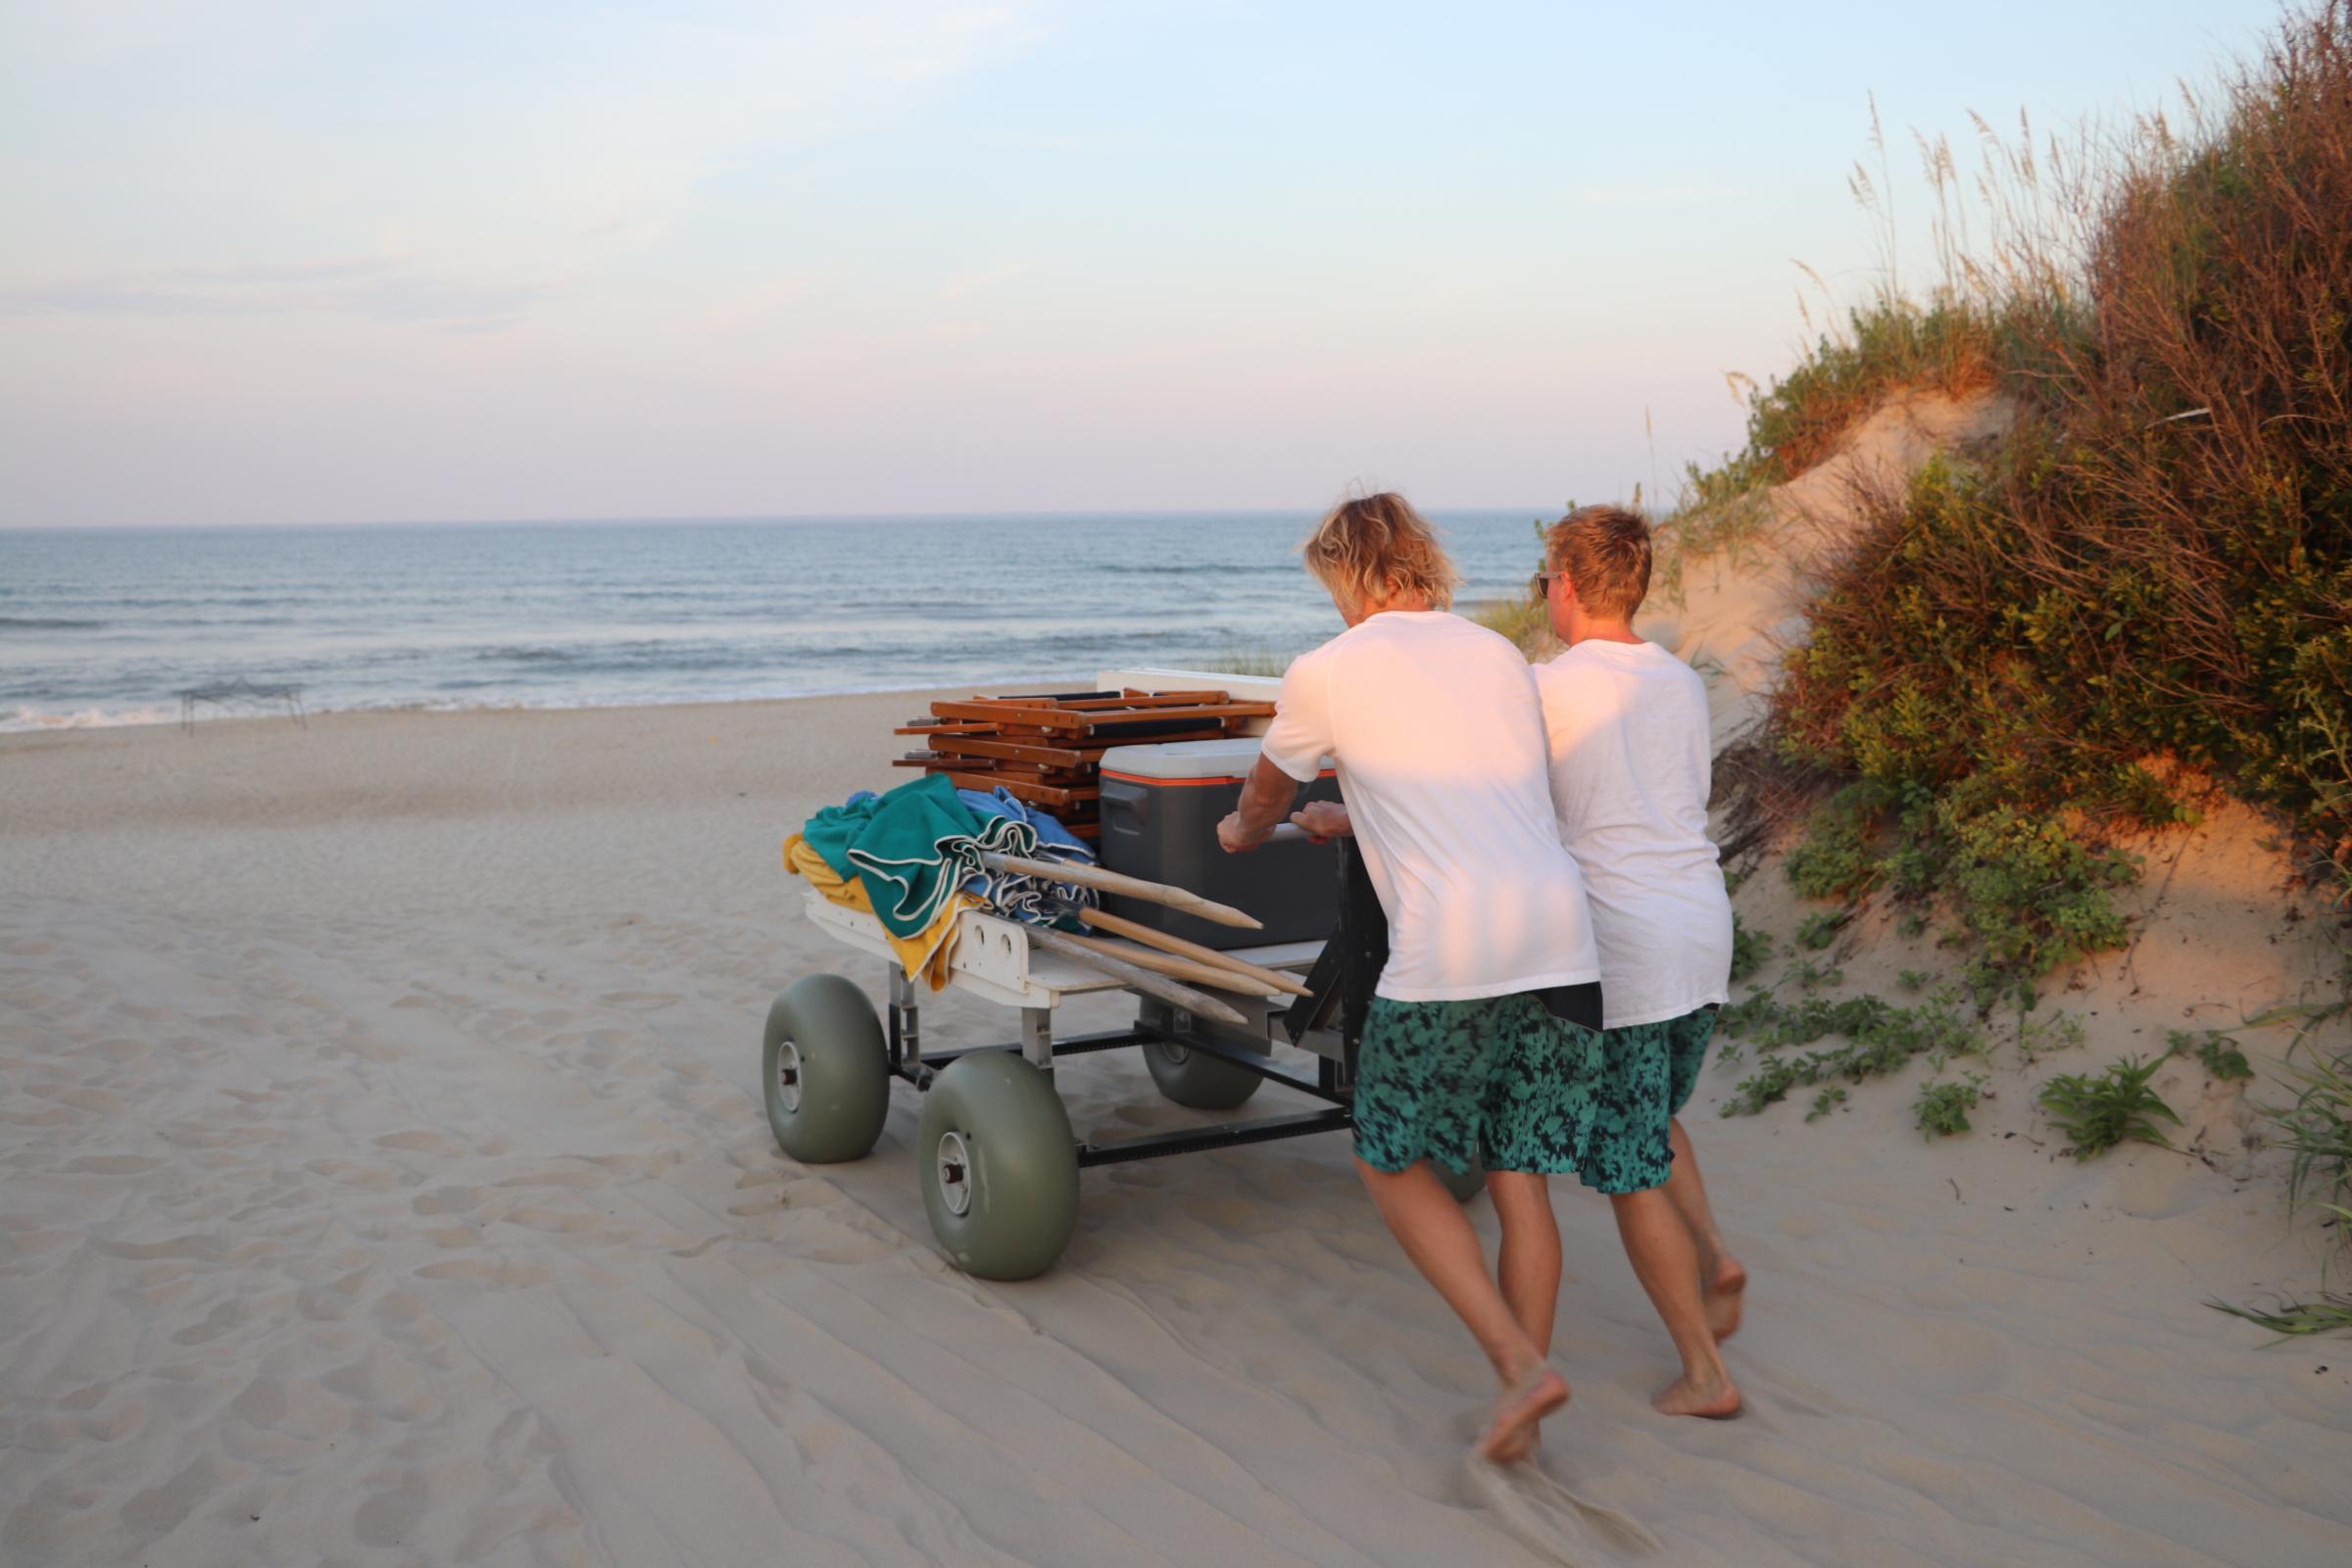 EnjoyTheBeach OBX staff members haul gear and beach equipment for OBX guests